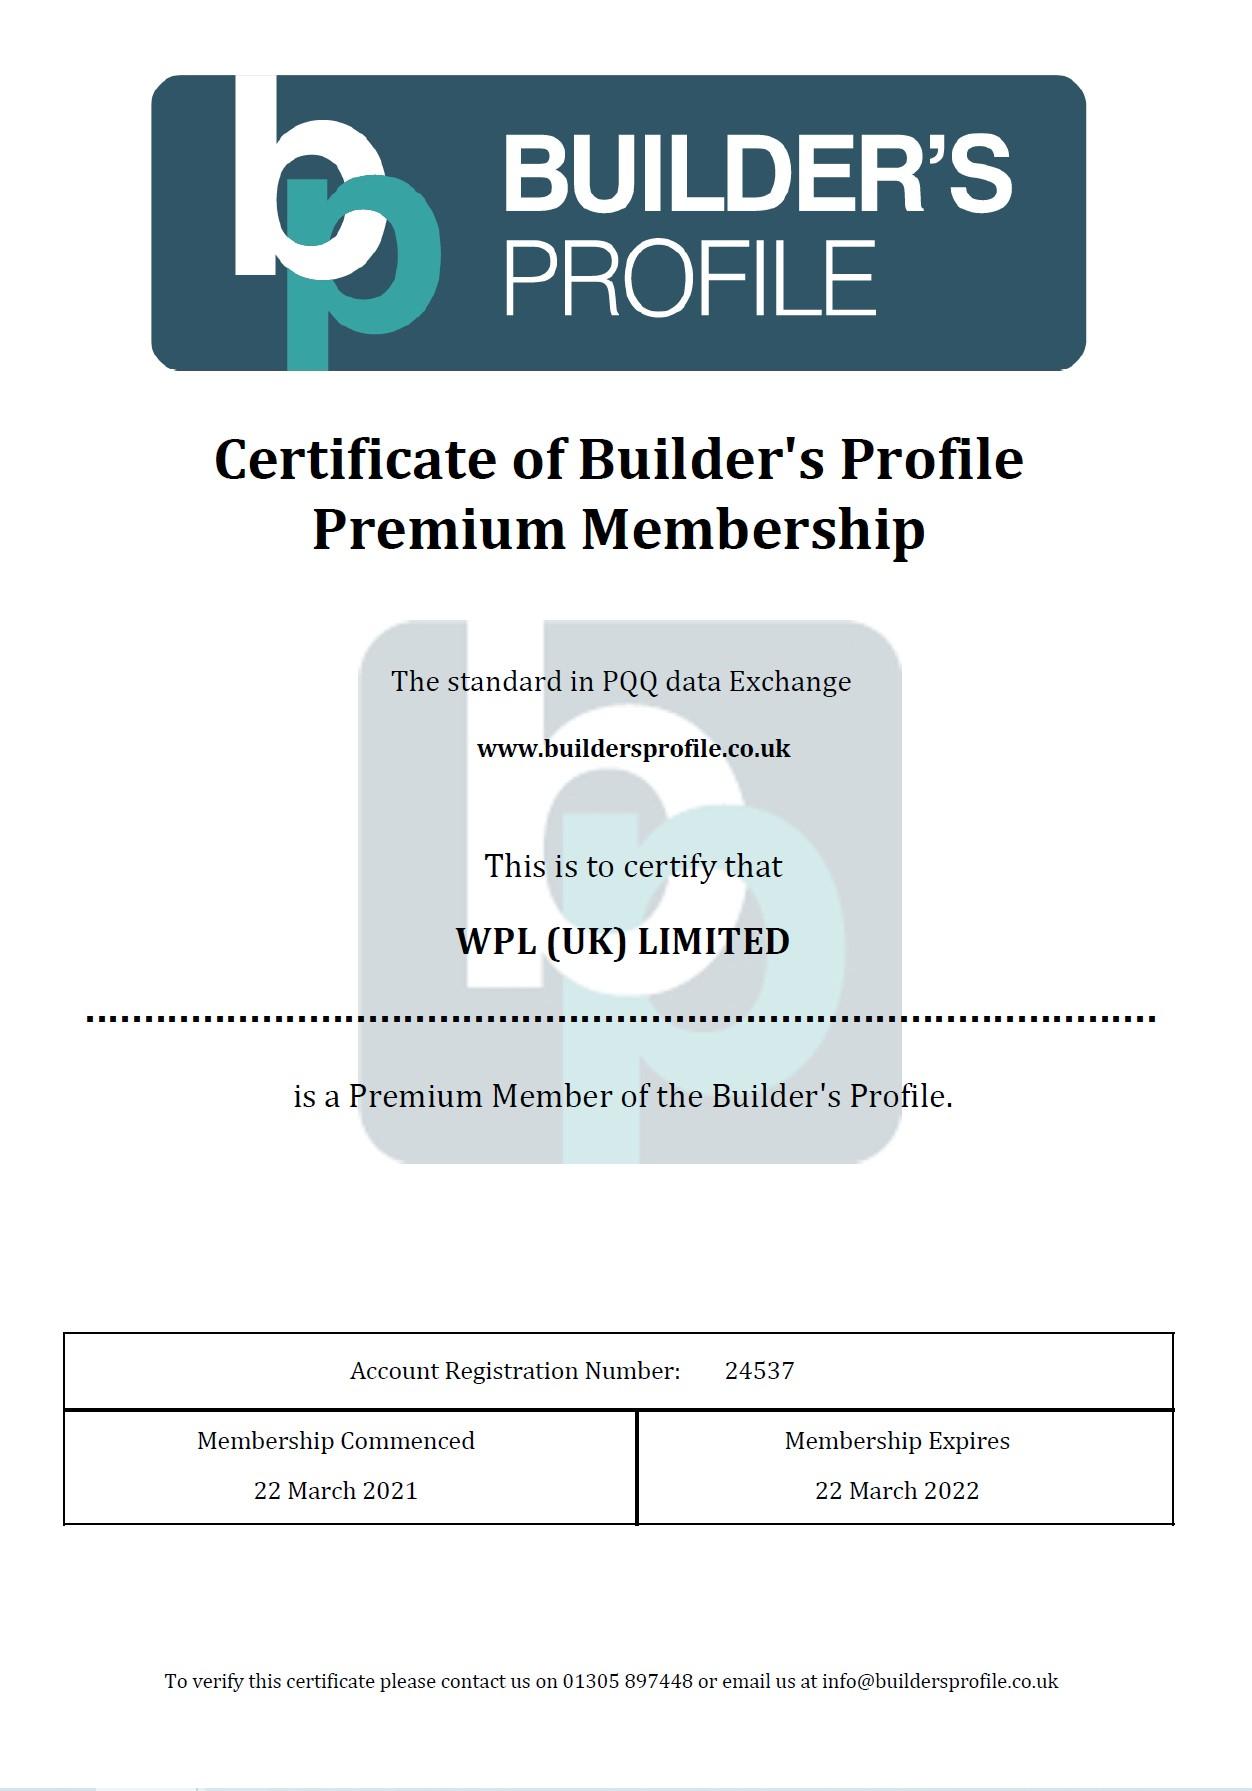 WPLUK Builder's Profile Premium Membership Certificate to 22nd March 2022